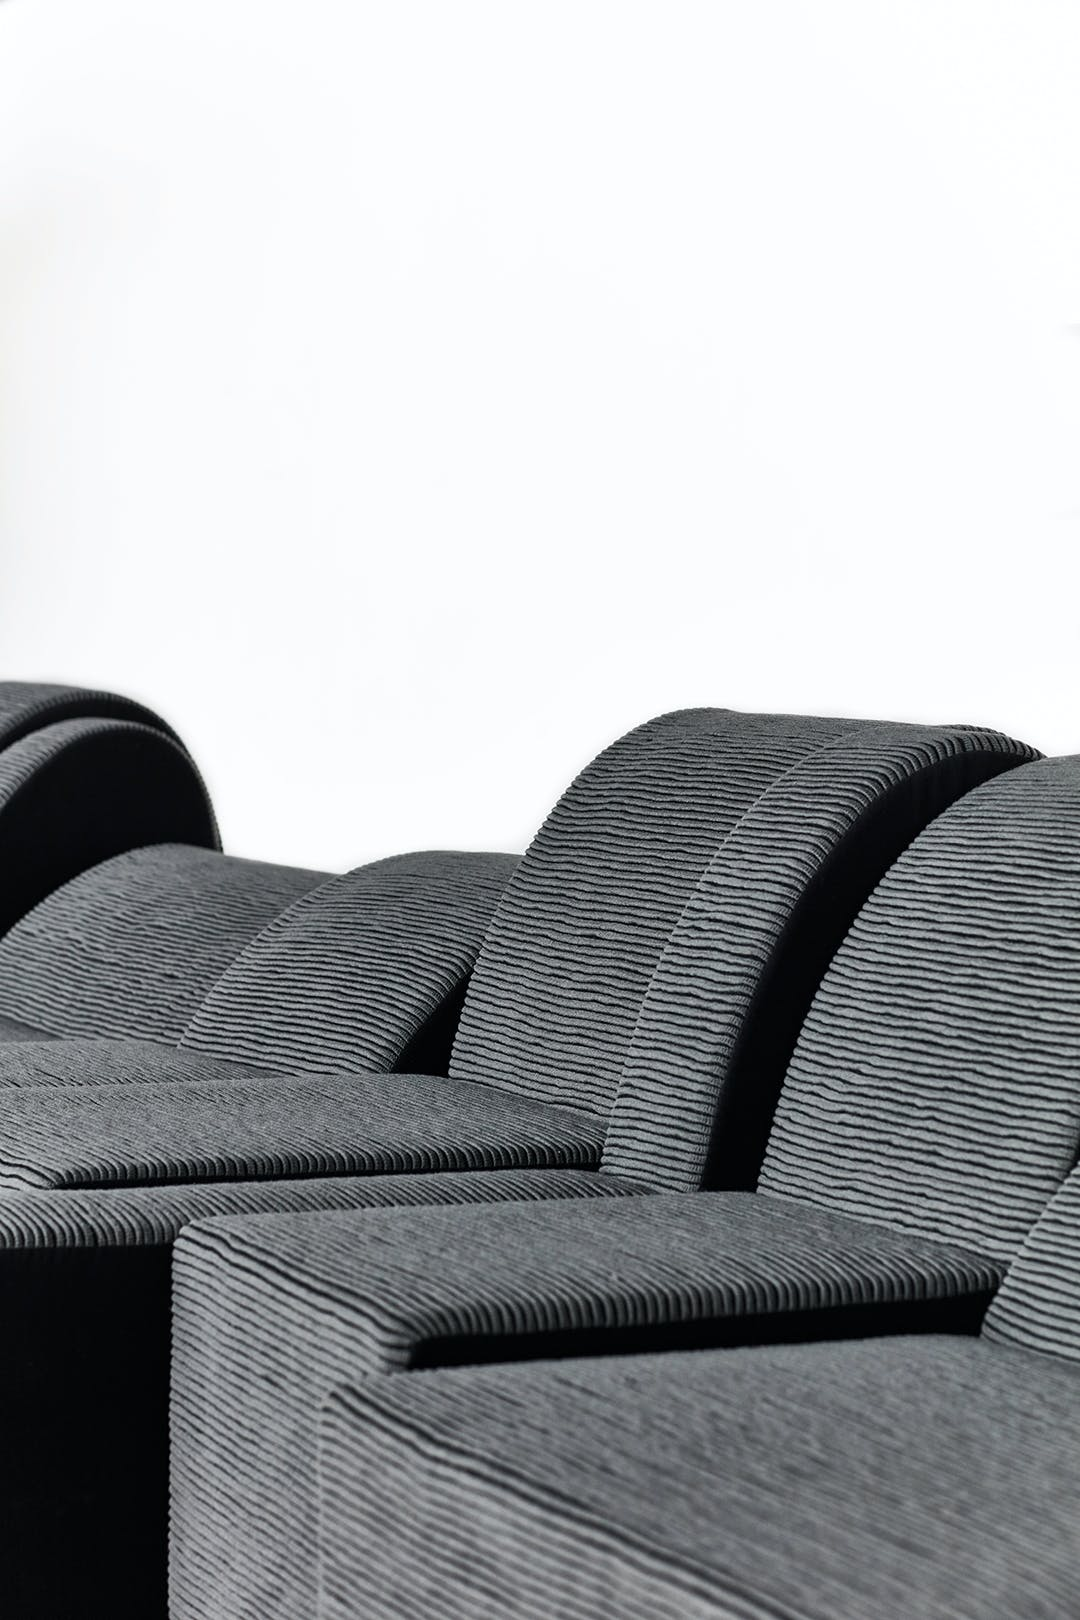 sofa kvadrat anders byriel inspiration